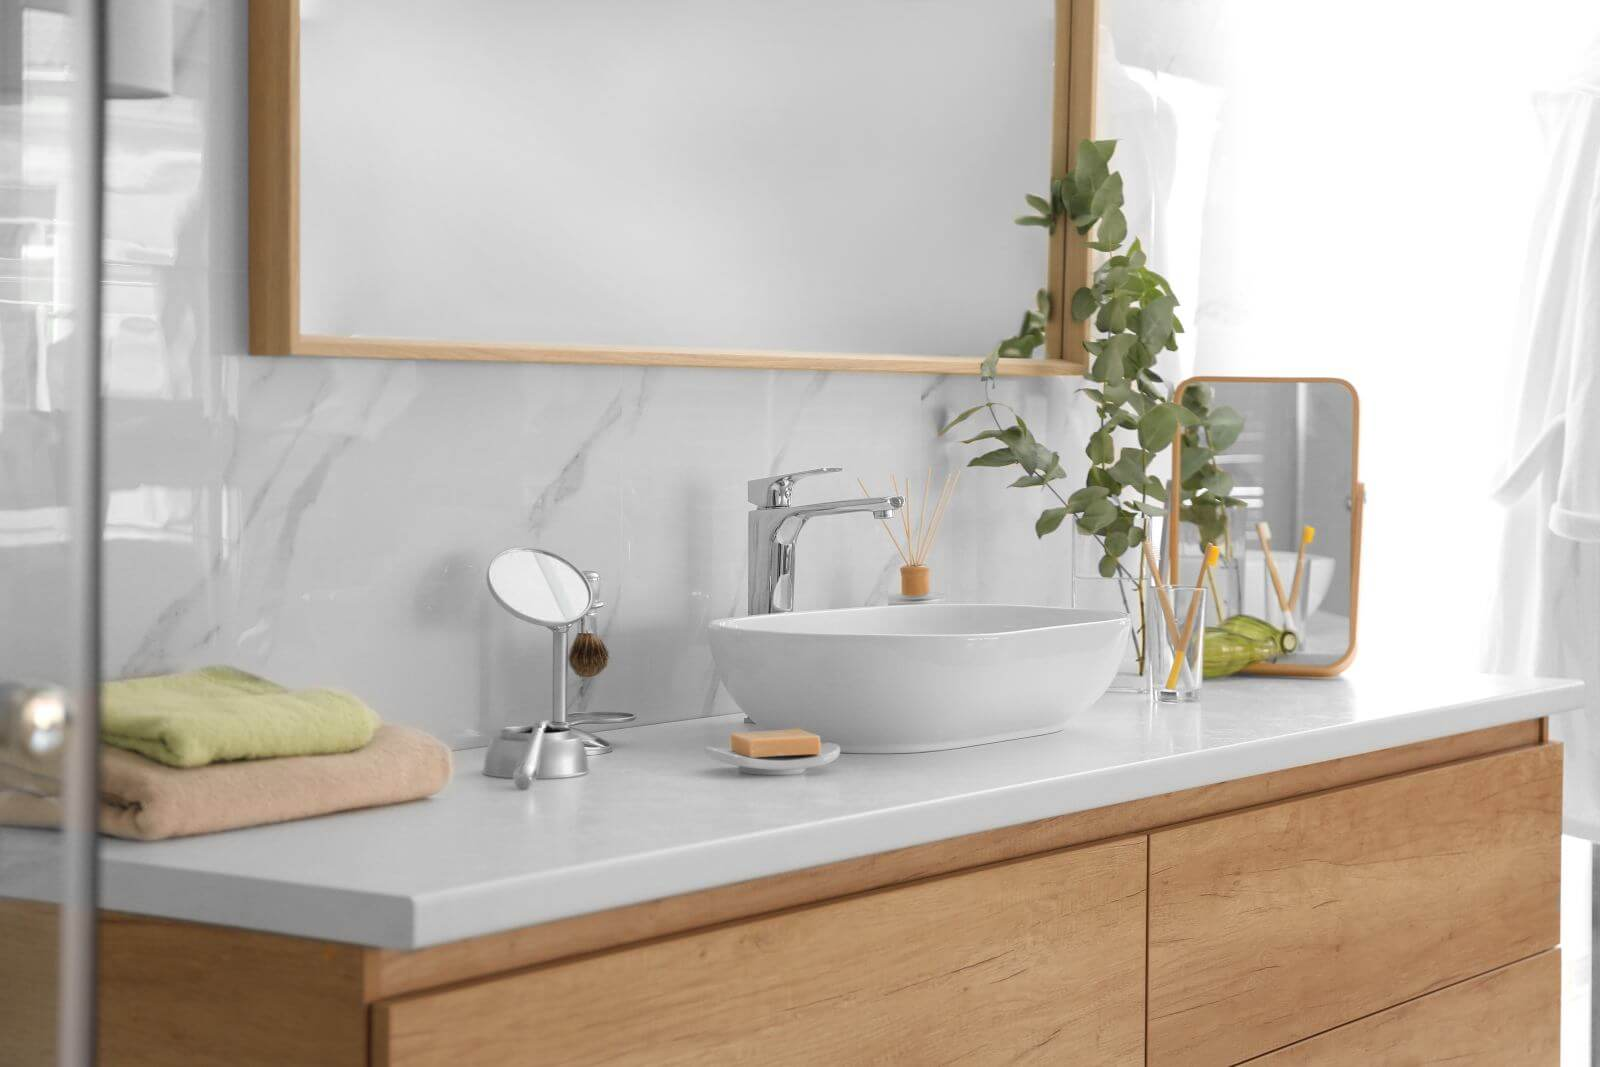 Modern bathroom interior with vessel sink and big mirror